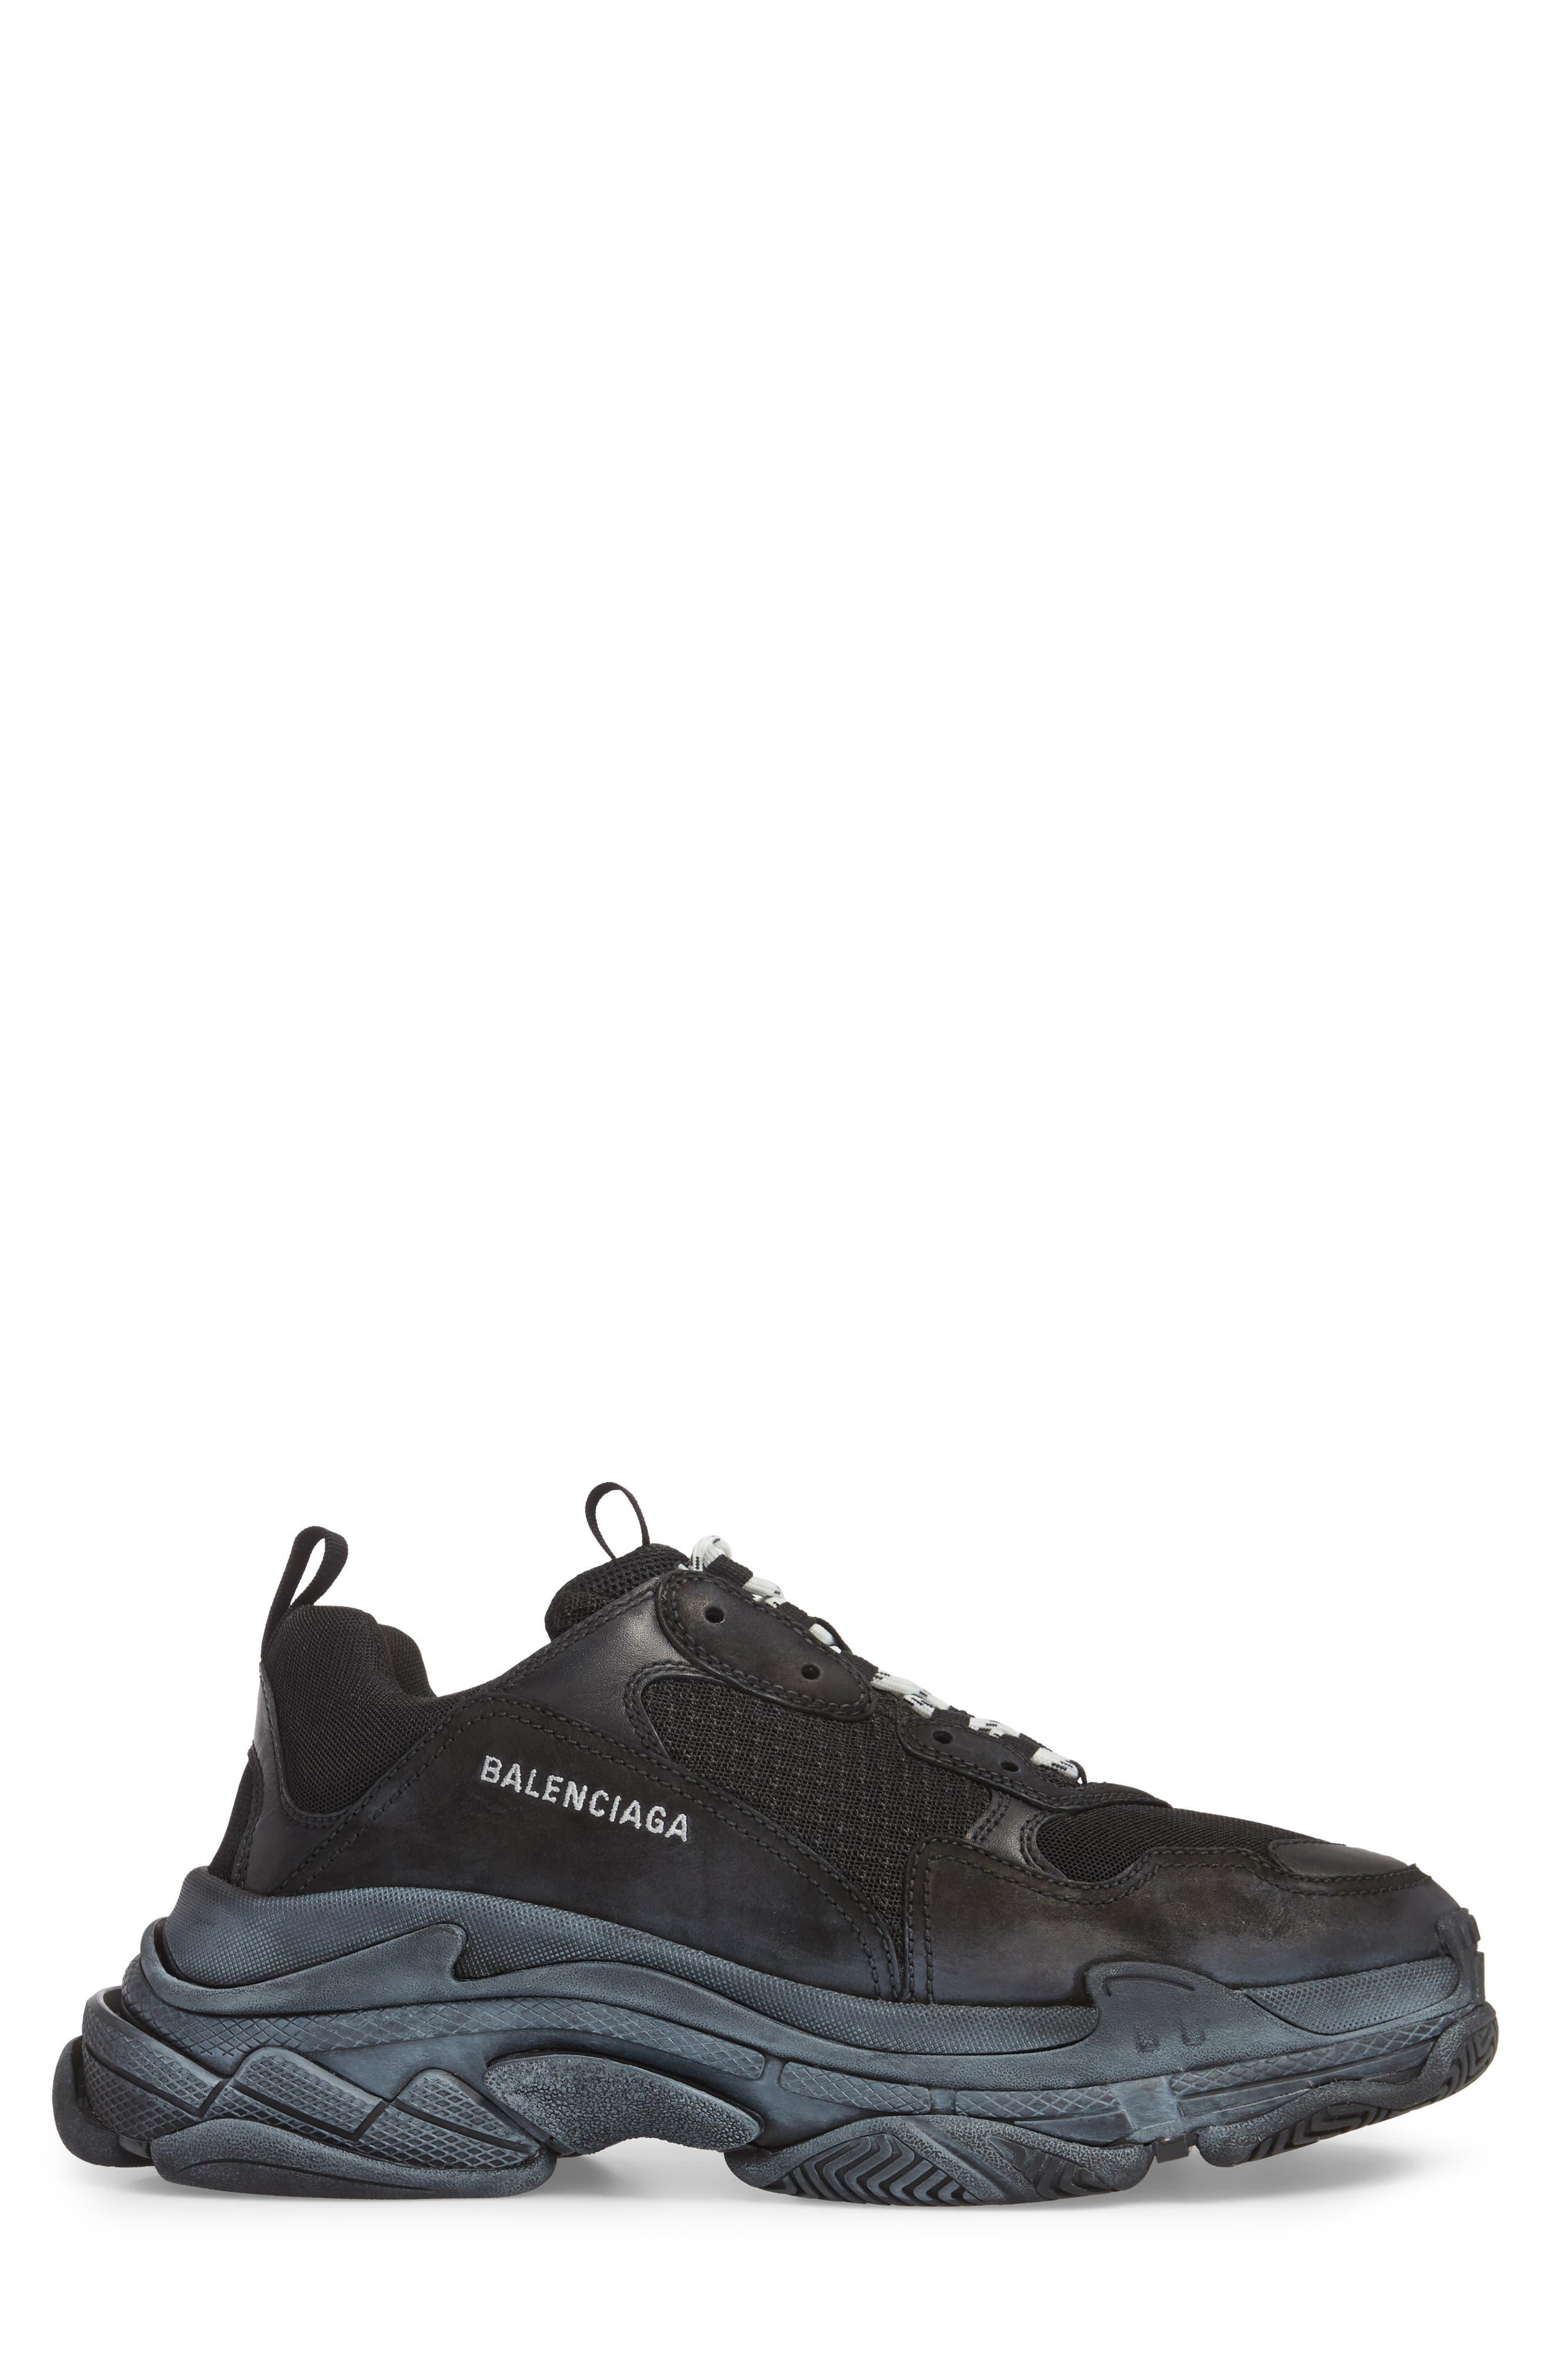 Triple S Retro Sneaker,                             Alternate thumbnail 3, color,                             NOIR